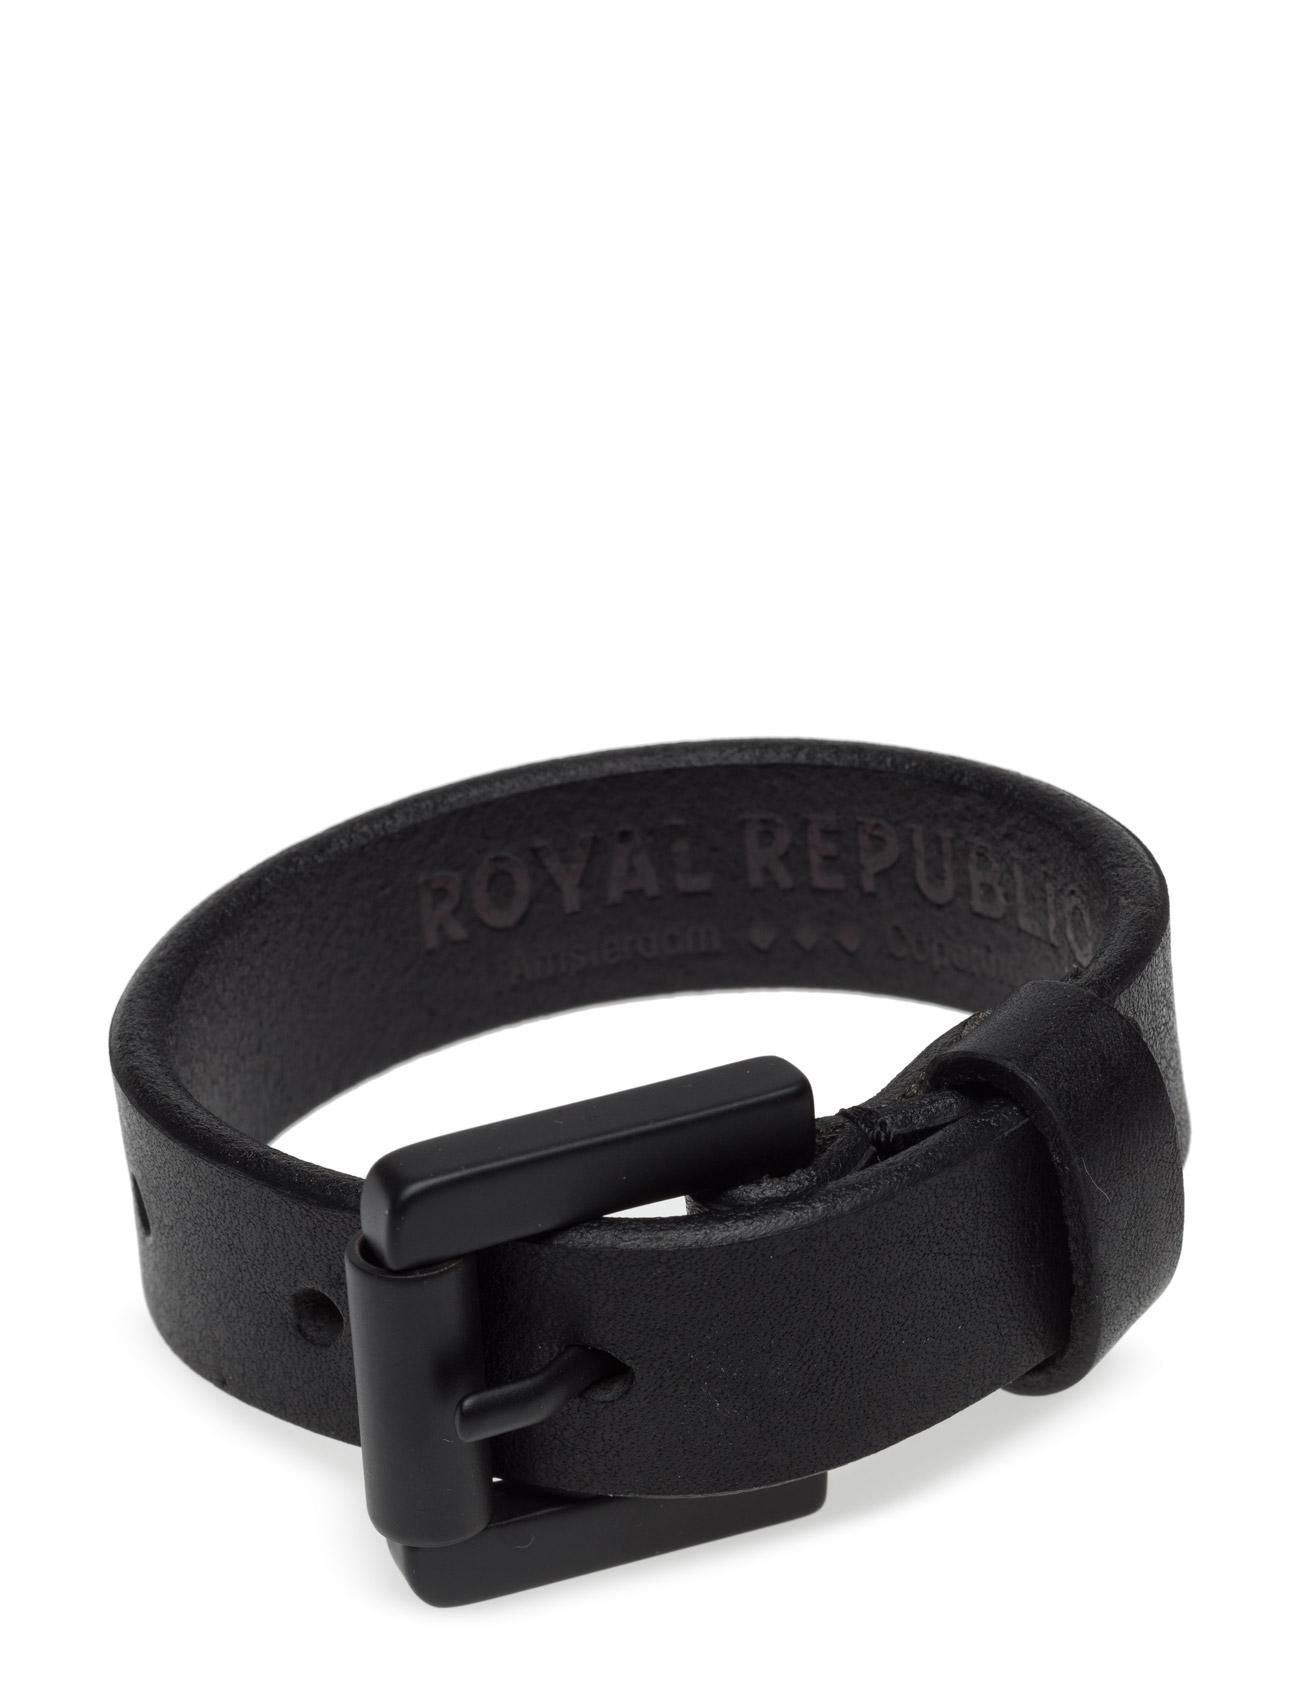 Coil Bracelet - Classic Royal RepubliQ Accessories til Mænd i Sort